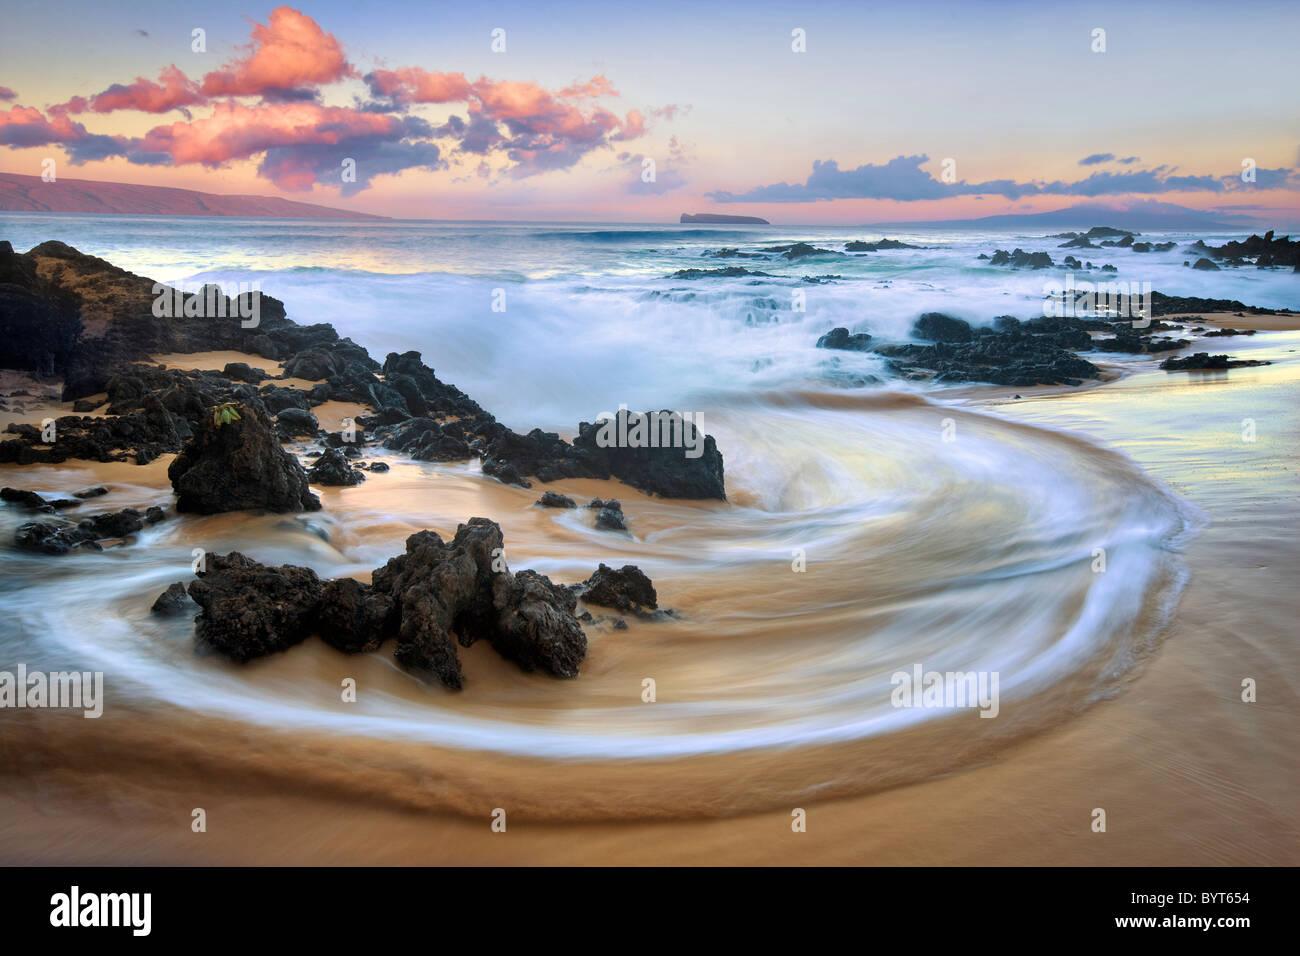 Wave pattern and sunrise clouds. Maui, Hawaii - Stock Image